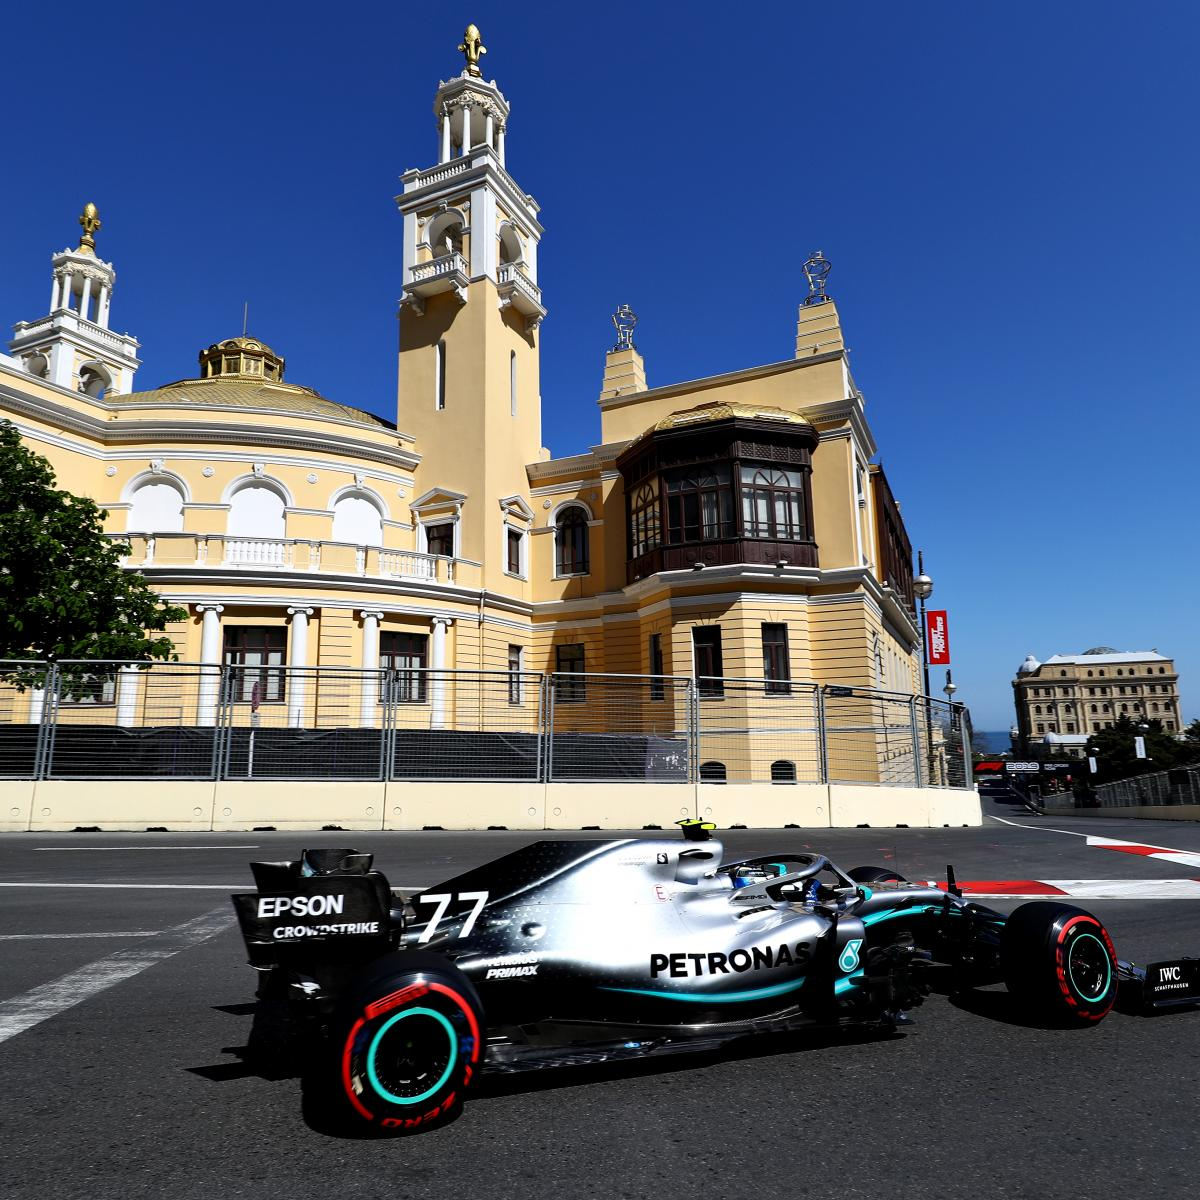 Azerbaijan News And Scores: Azerbaijan F1 Grand Prix 2019 Qualifying: Saturday's